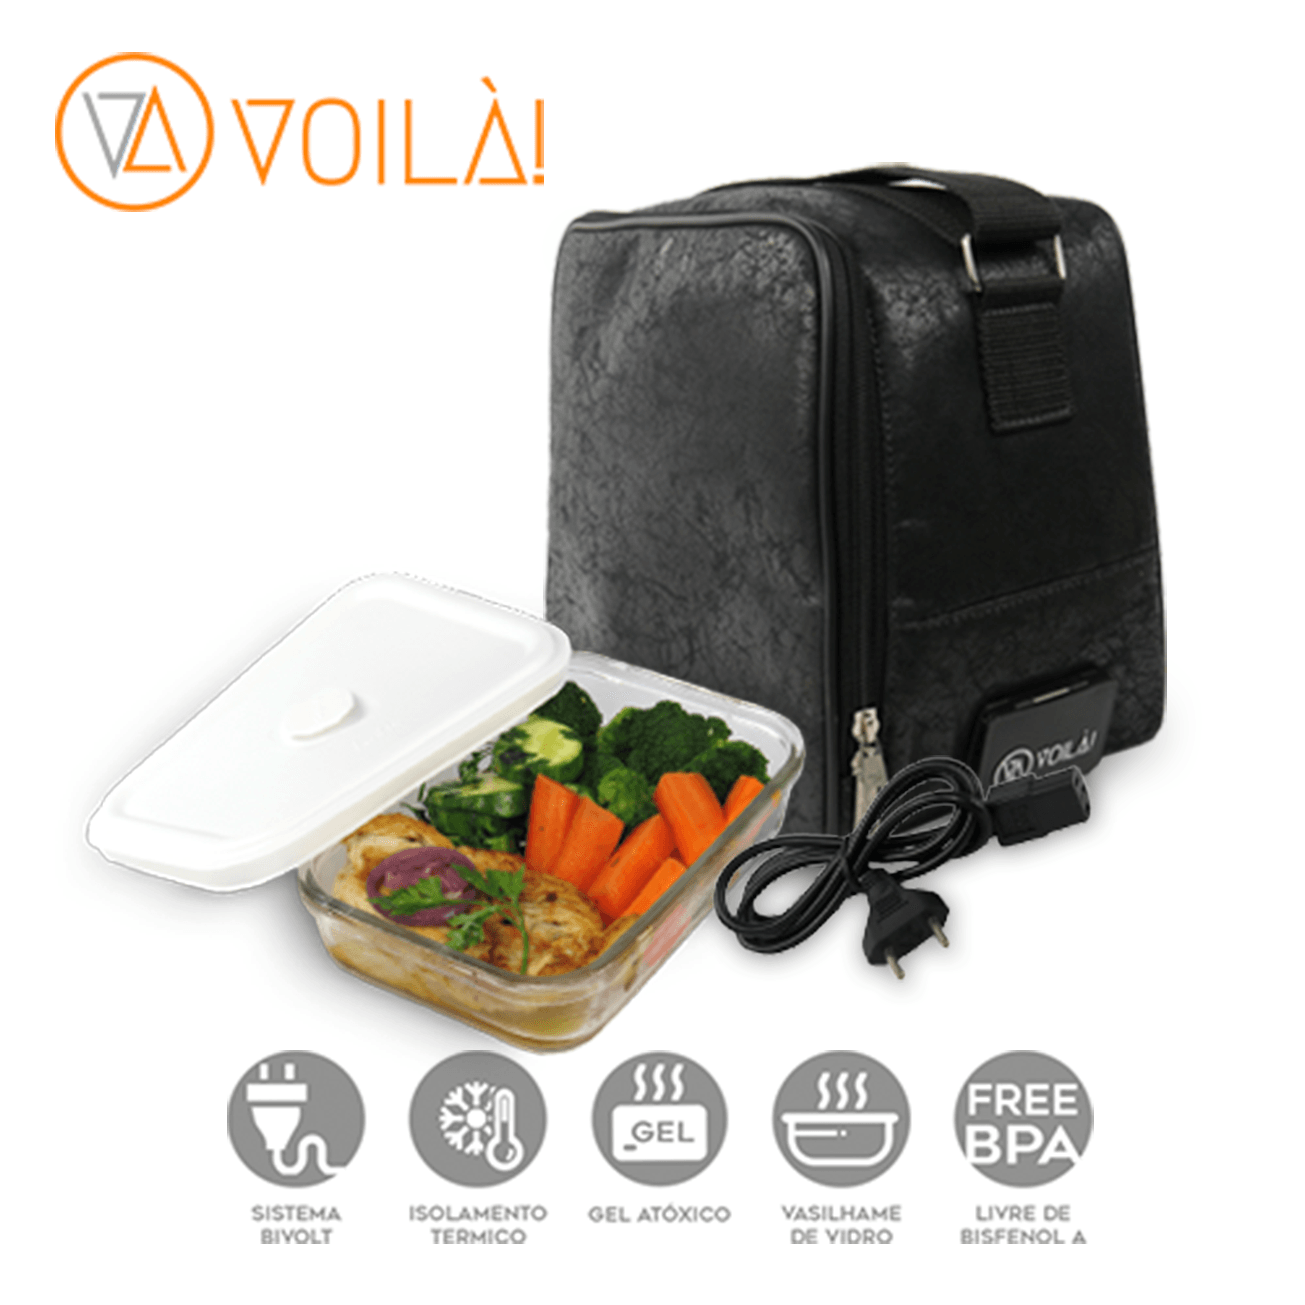 Bolsa Elétrica Voilà! Bag - Nobuck + Vasilhame BPAFree